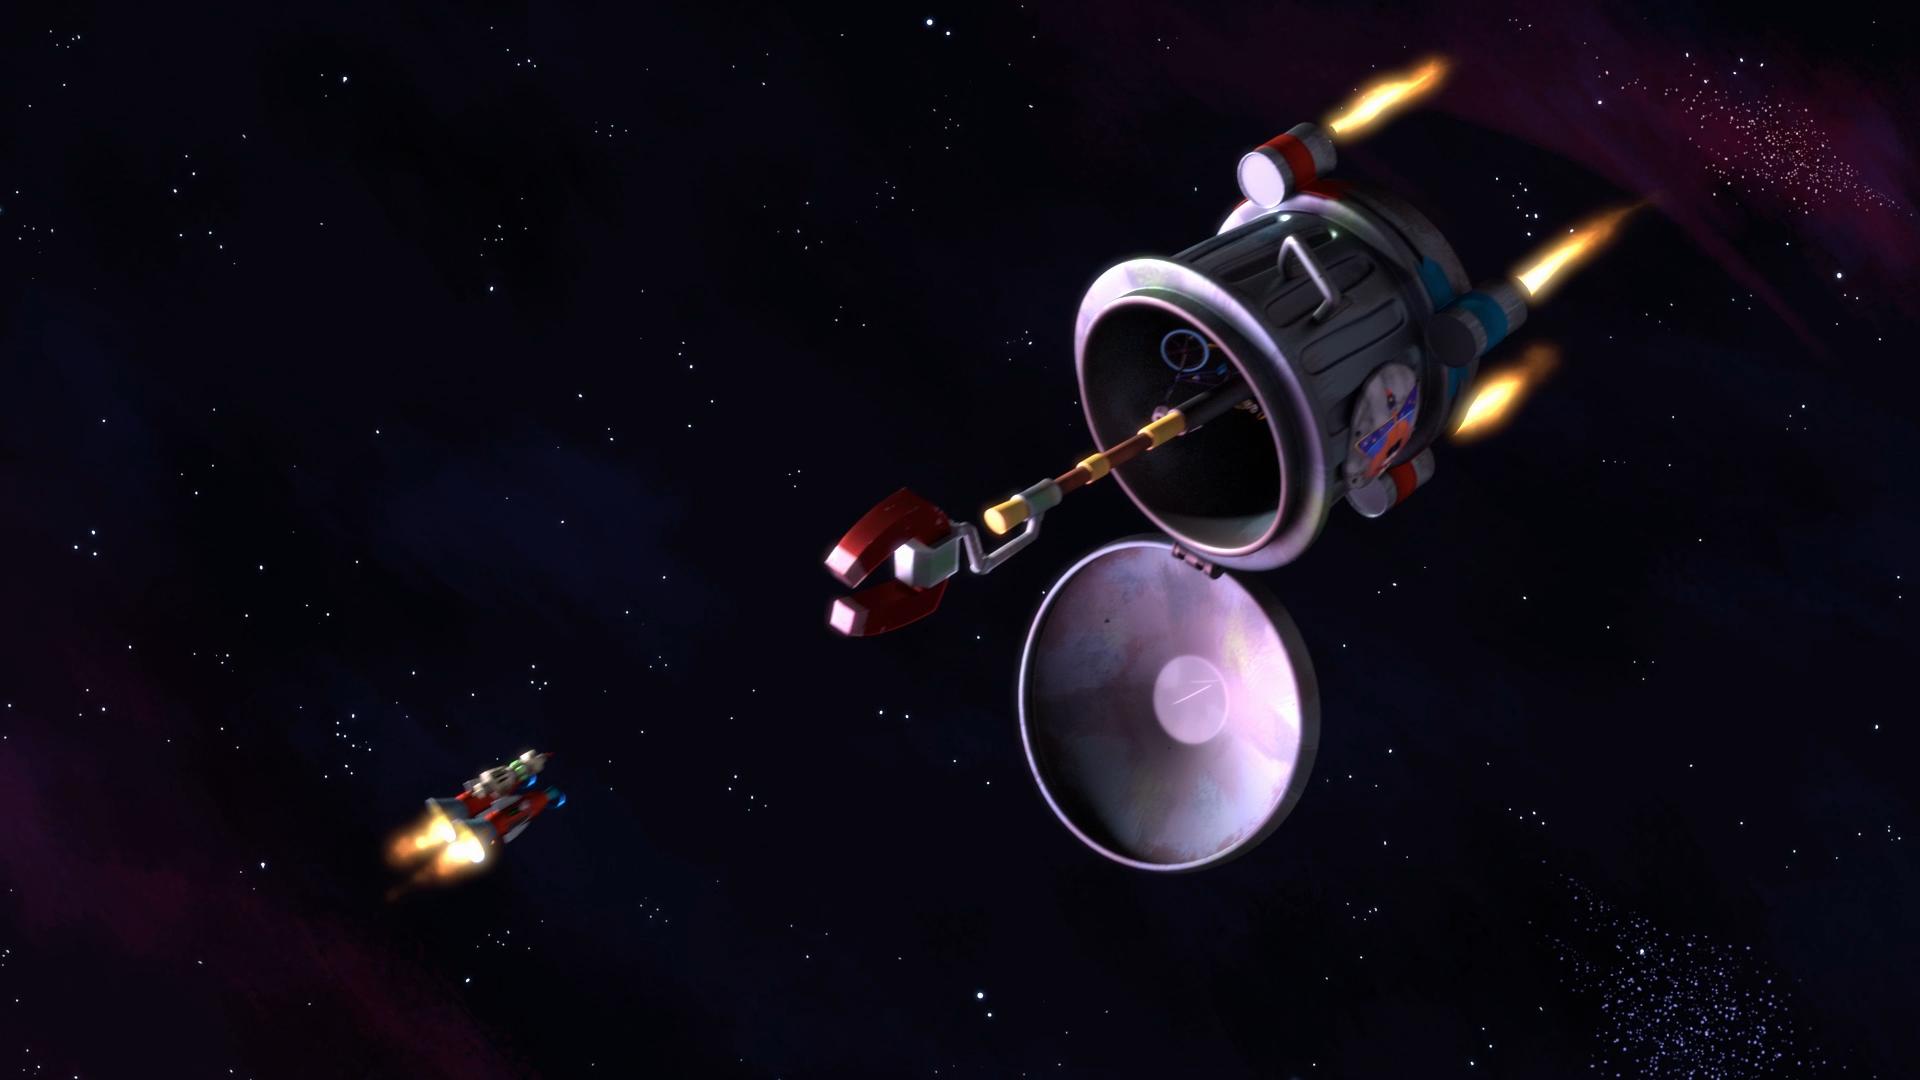 Dennis & Gnasher Unleashed! Episode 44: Pi in the Sky